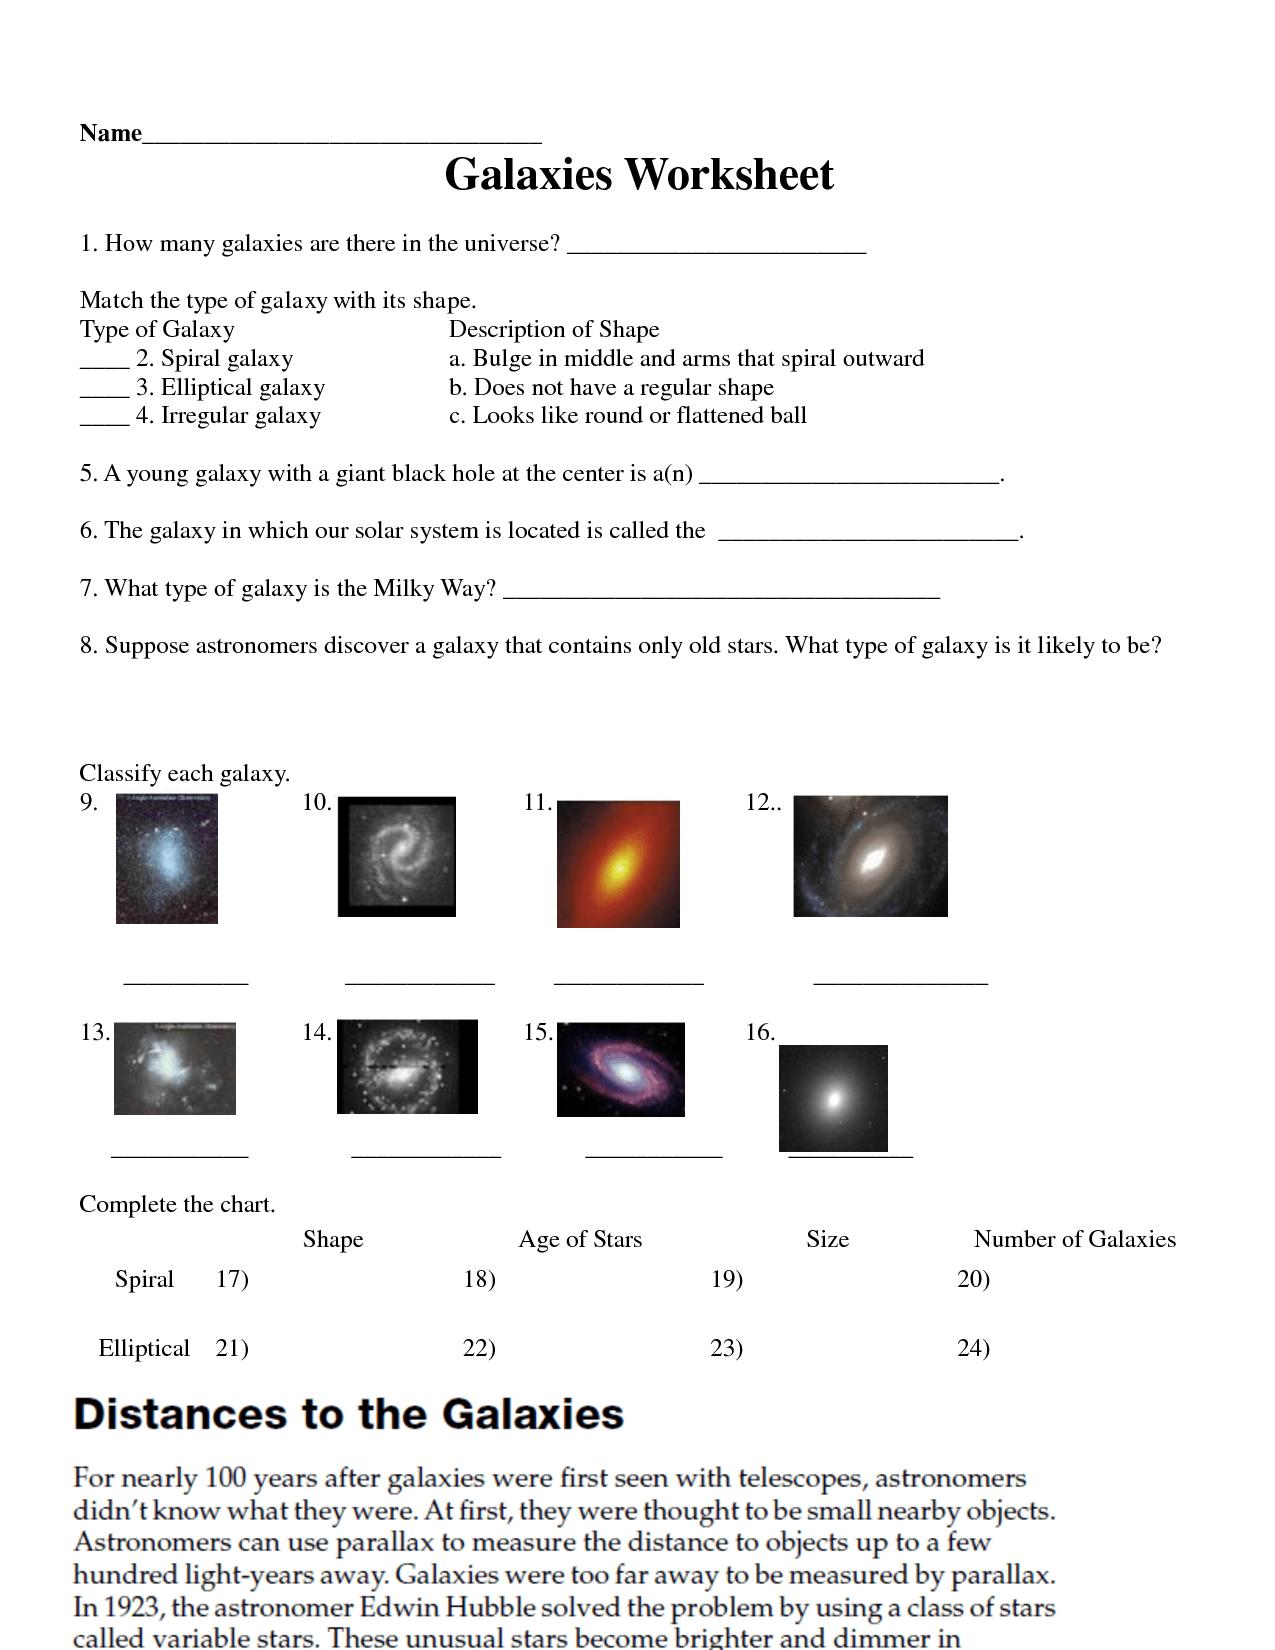 Galaxy Worksheet